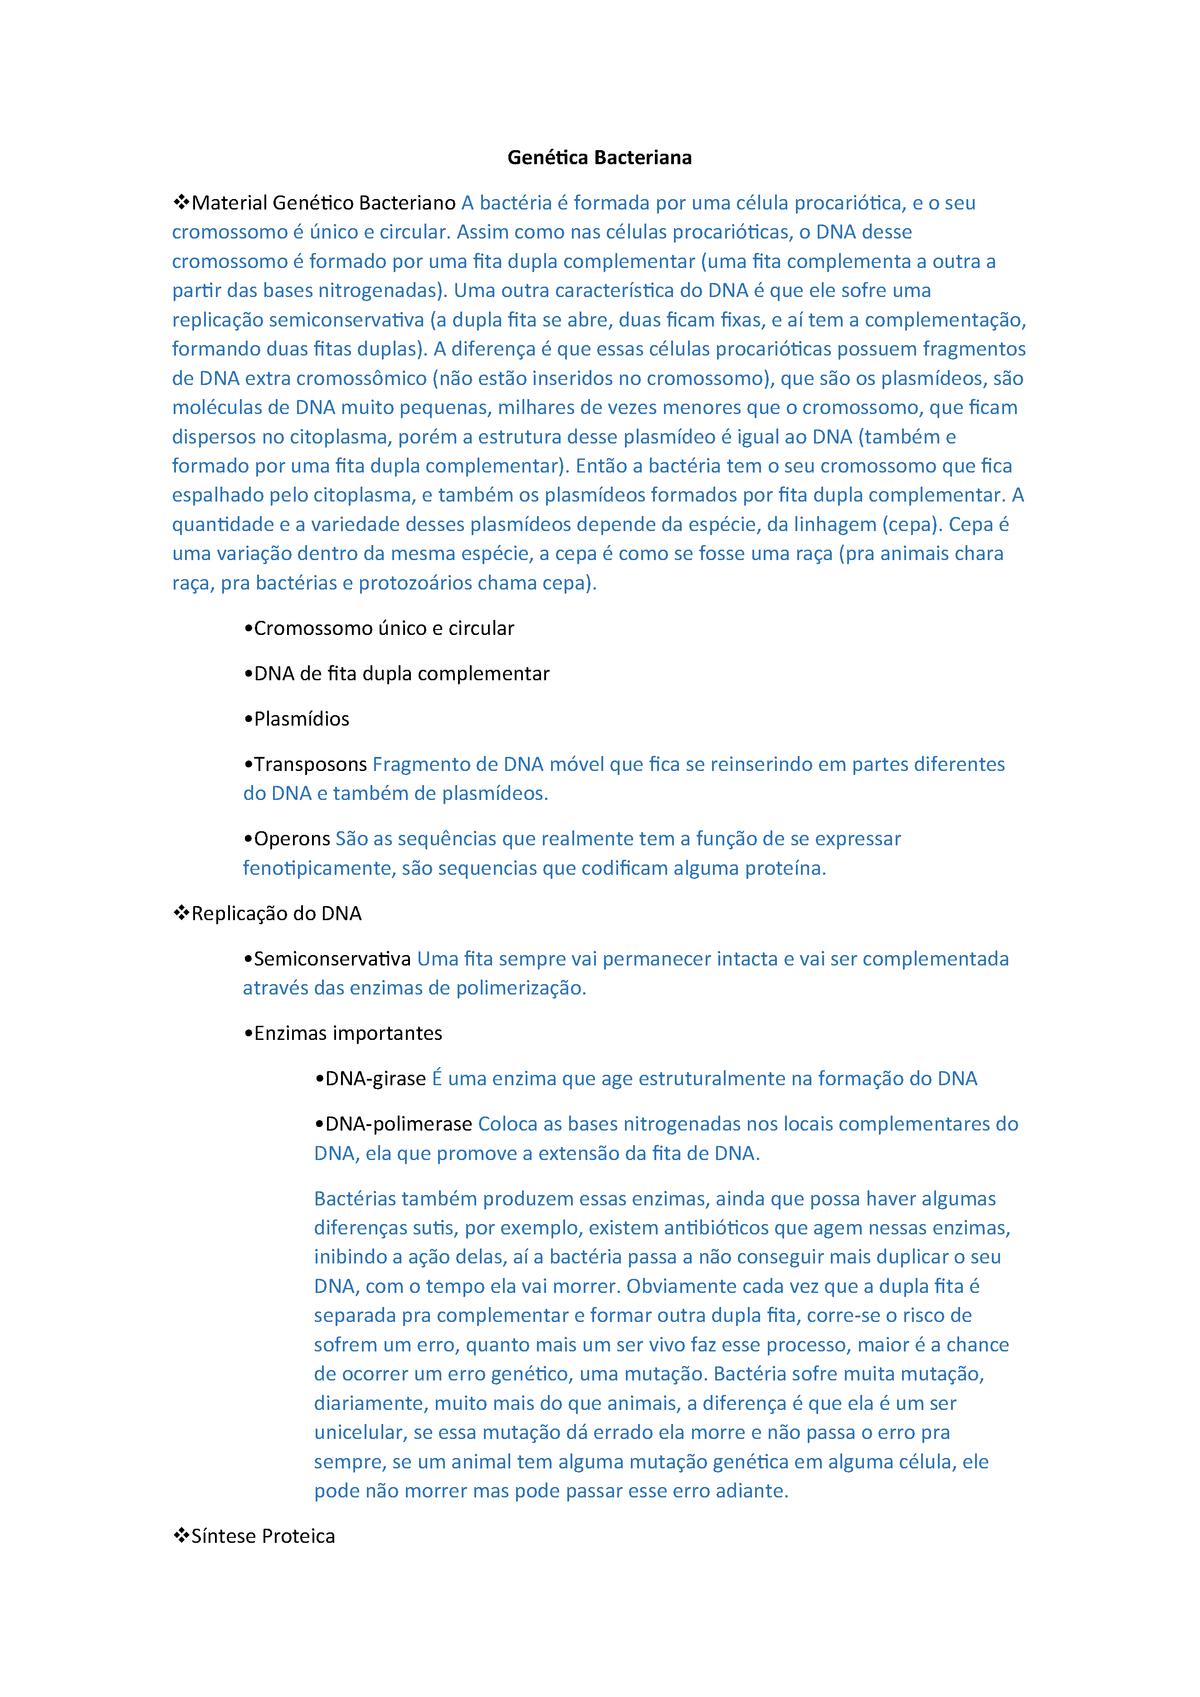 Bacteriologia 3 Genética Bacteriana Ics0019 Ufg Studocu